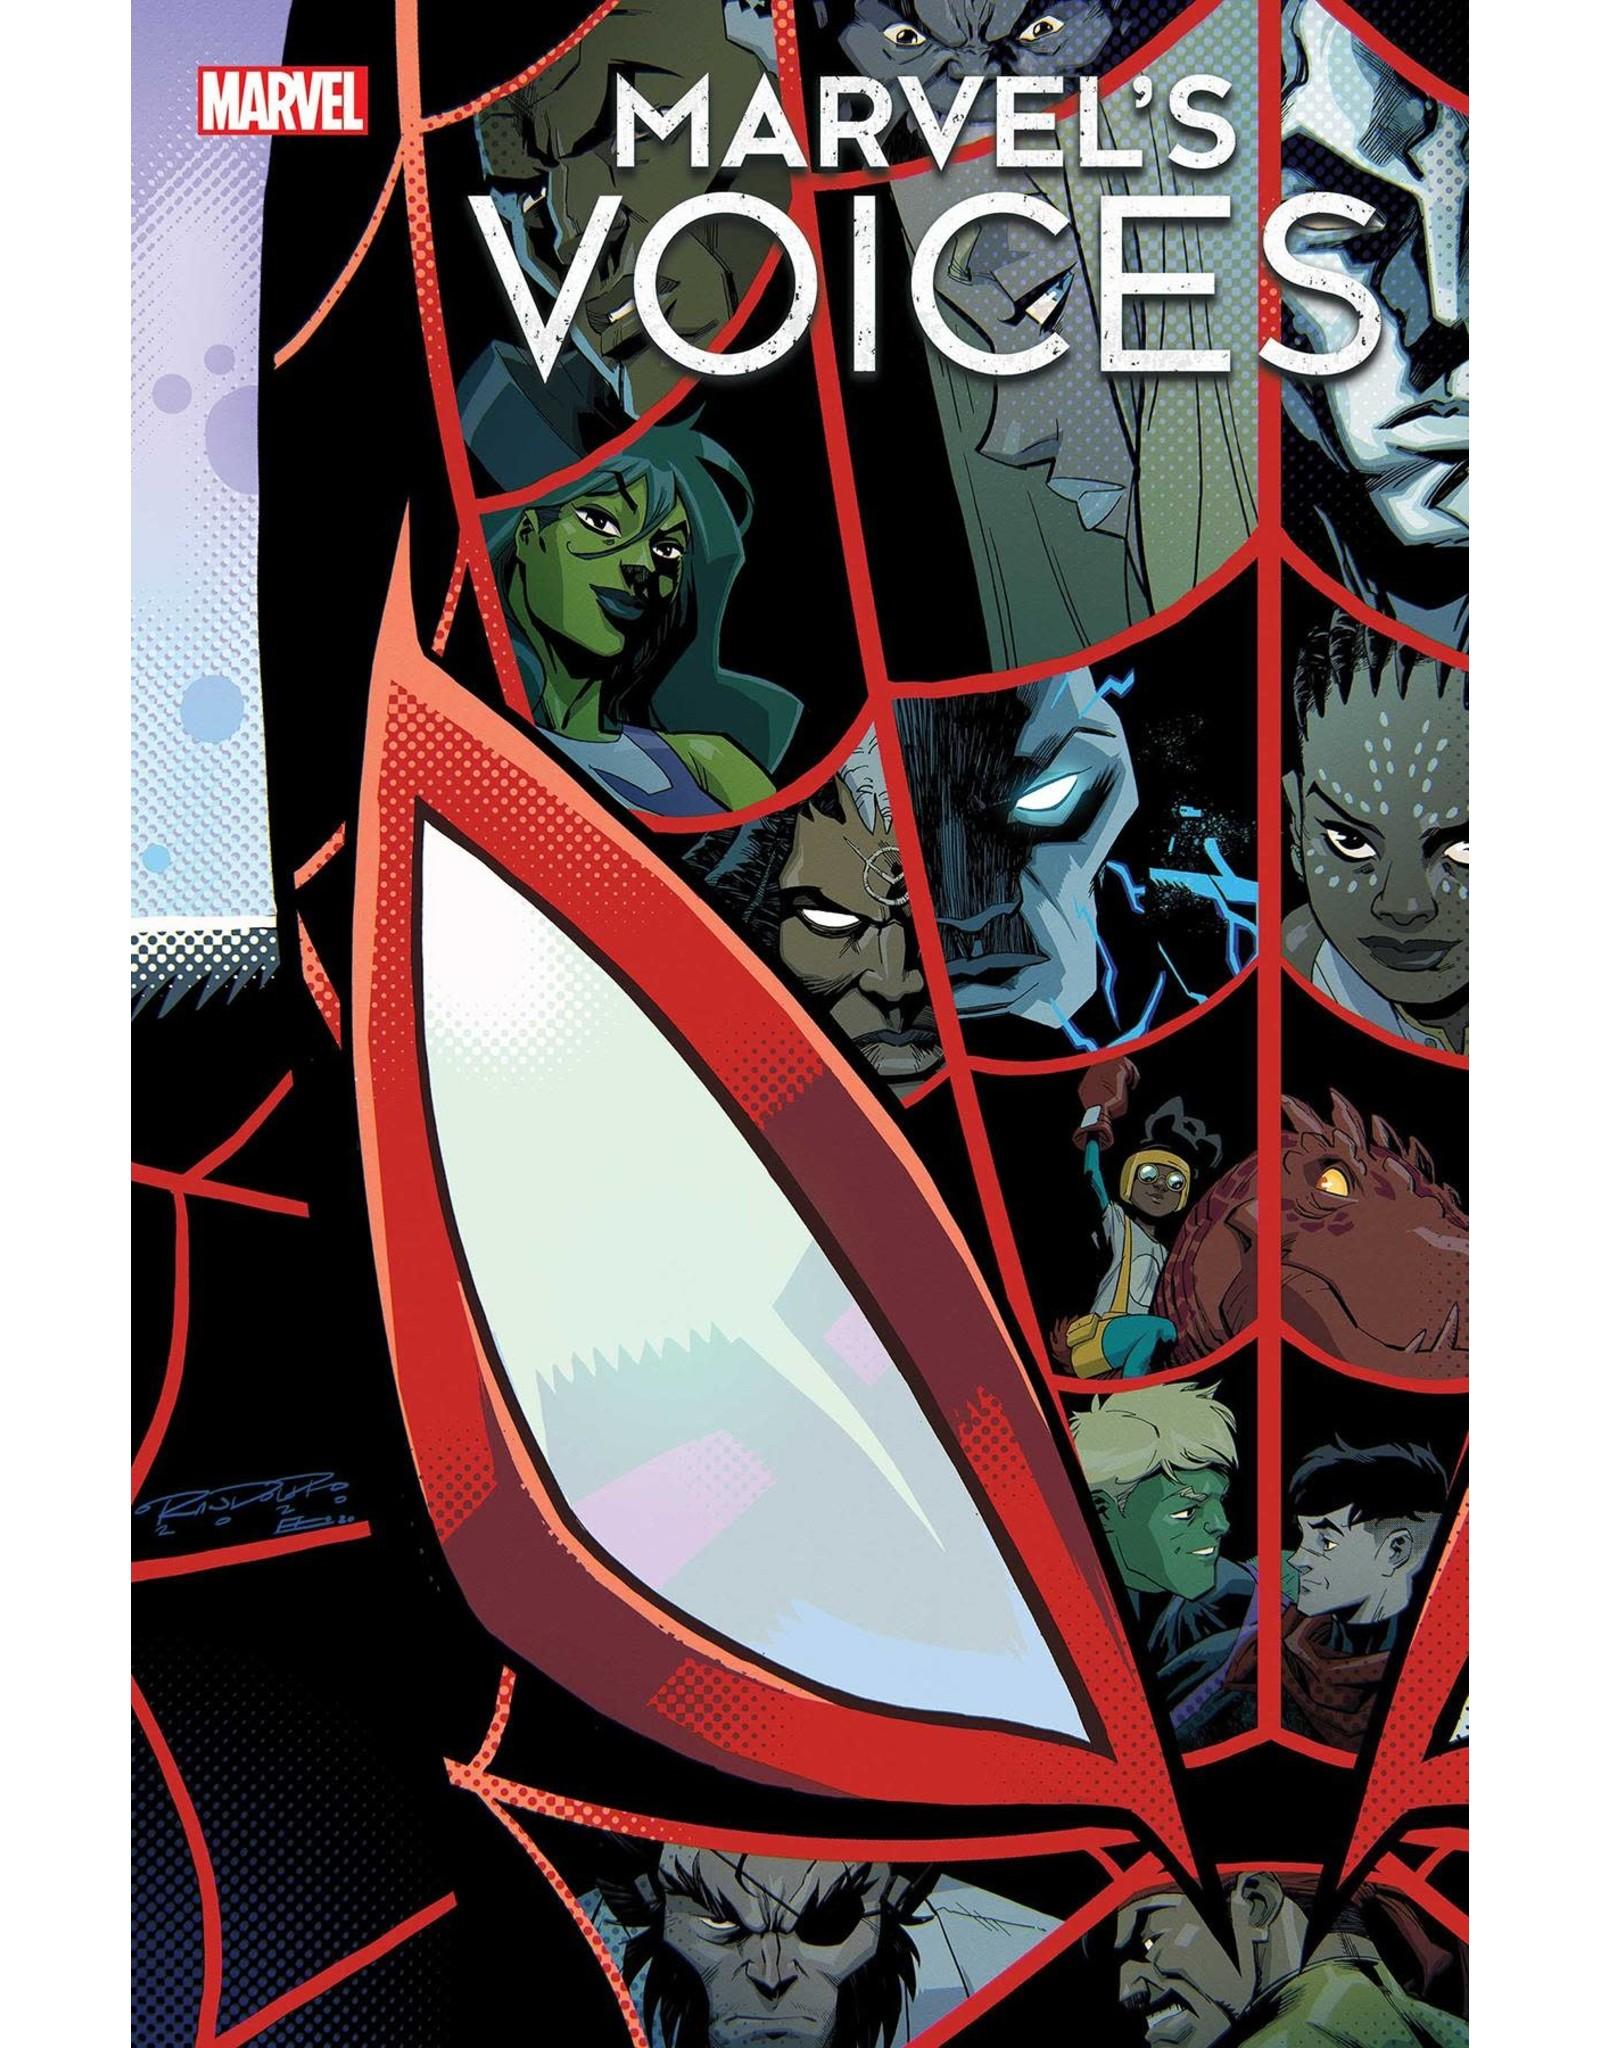 Marvel Comics MARVELS VOICES #1 NEW PTG